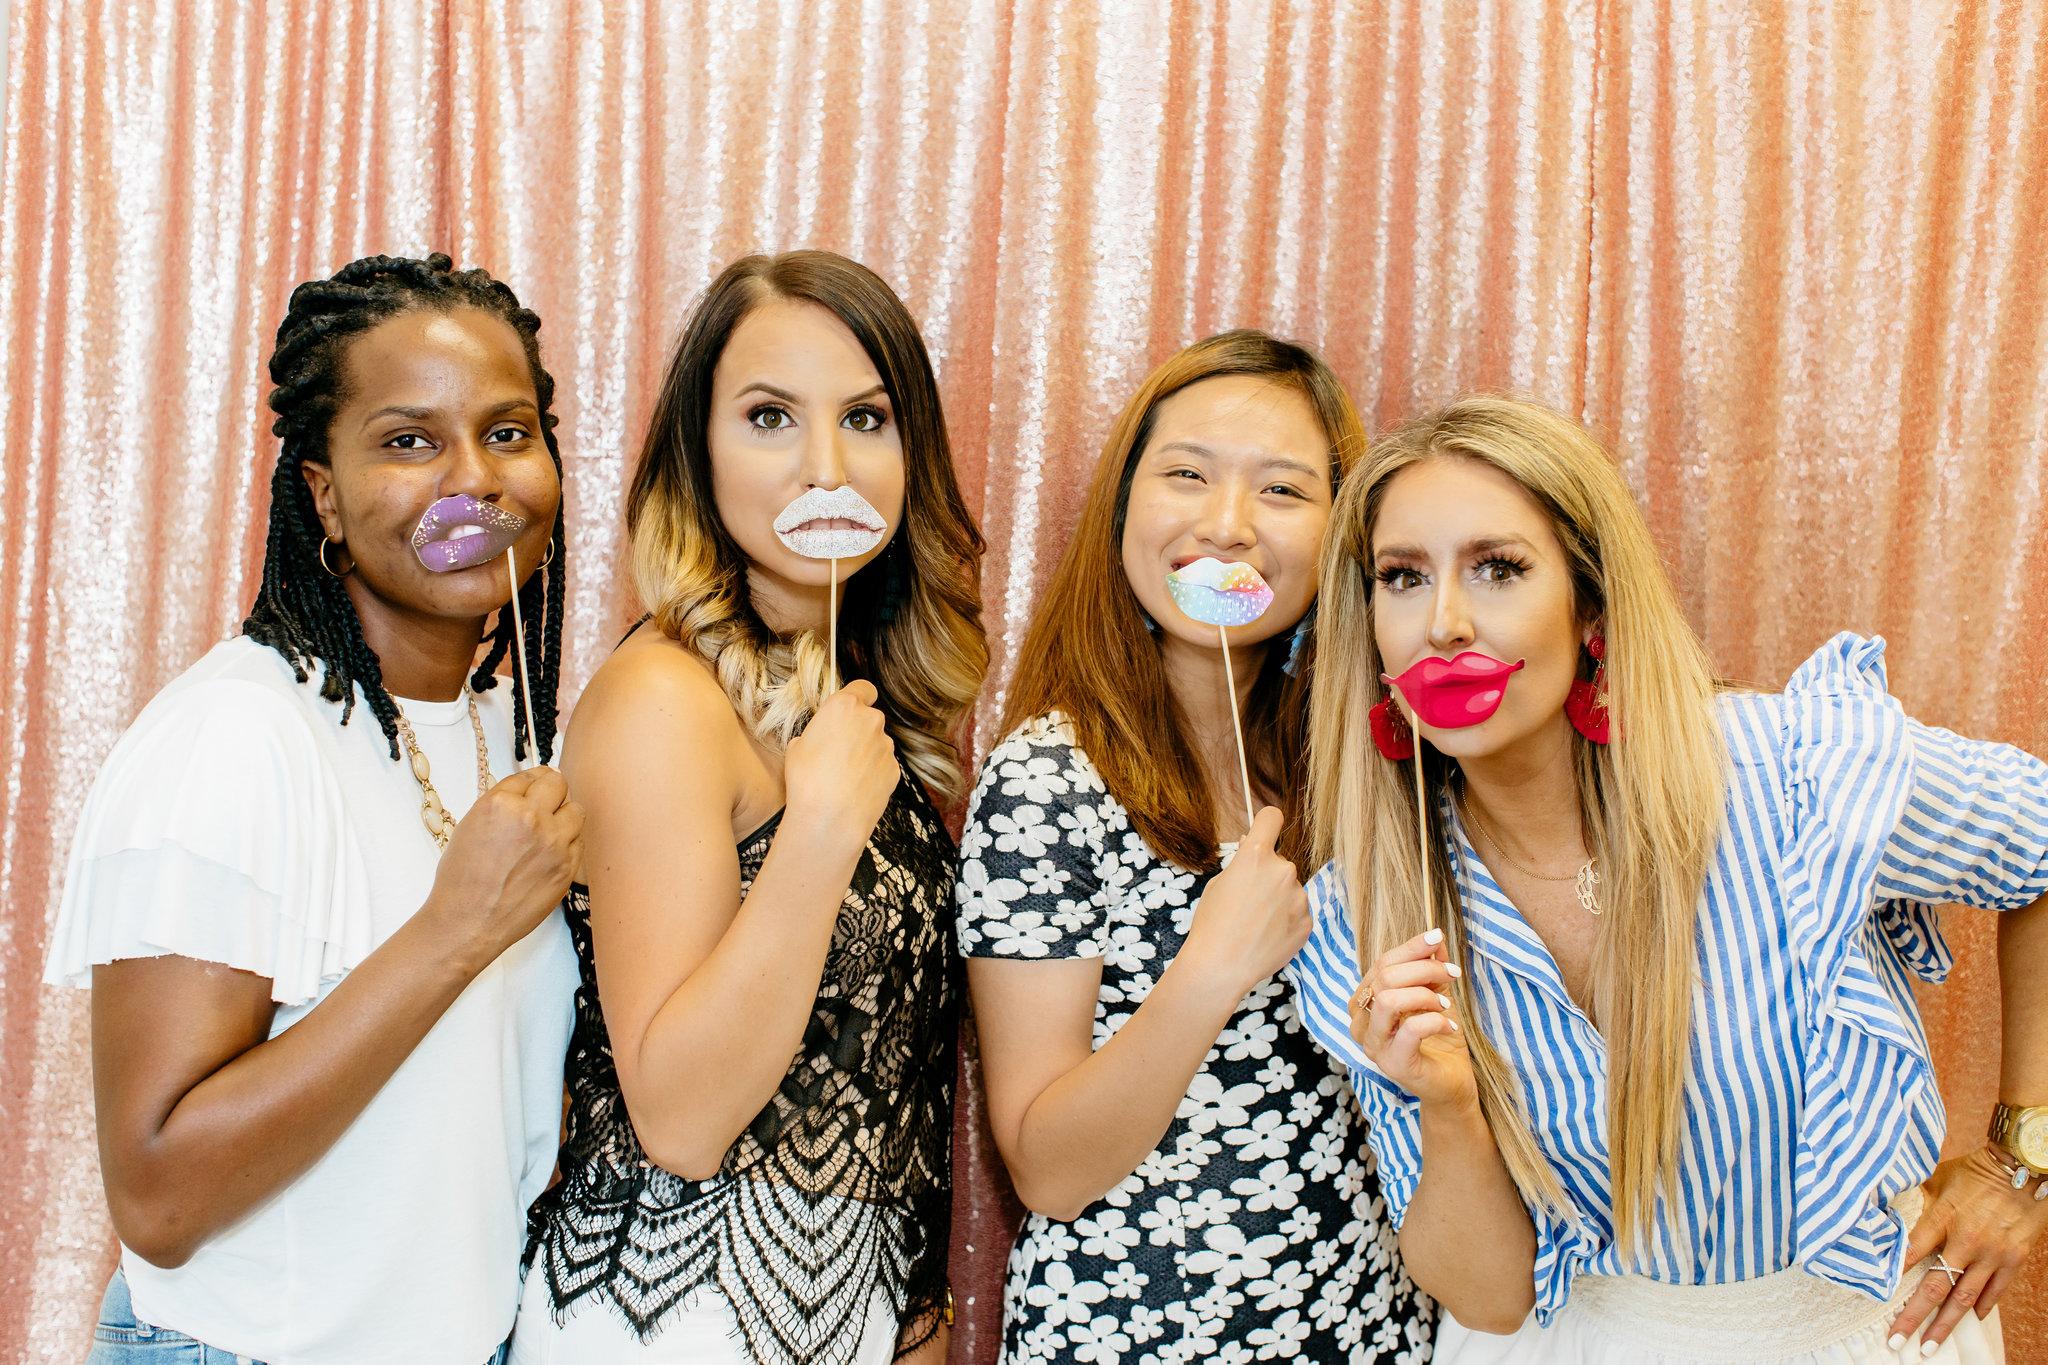 Alexa-Vossler-Photo_Dallas-Event-Photographer_Brite-Bar-Beauty-2018-Lipstick-Launch-Party-12.jpg